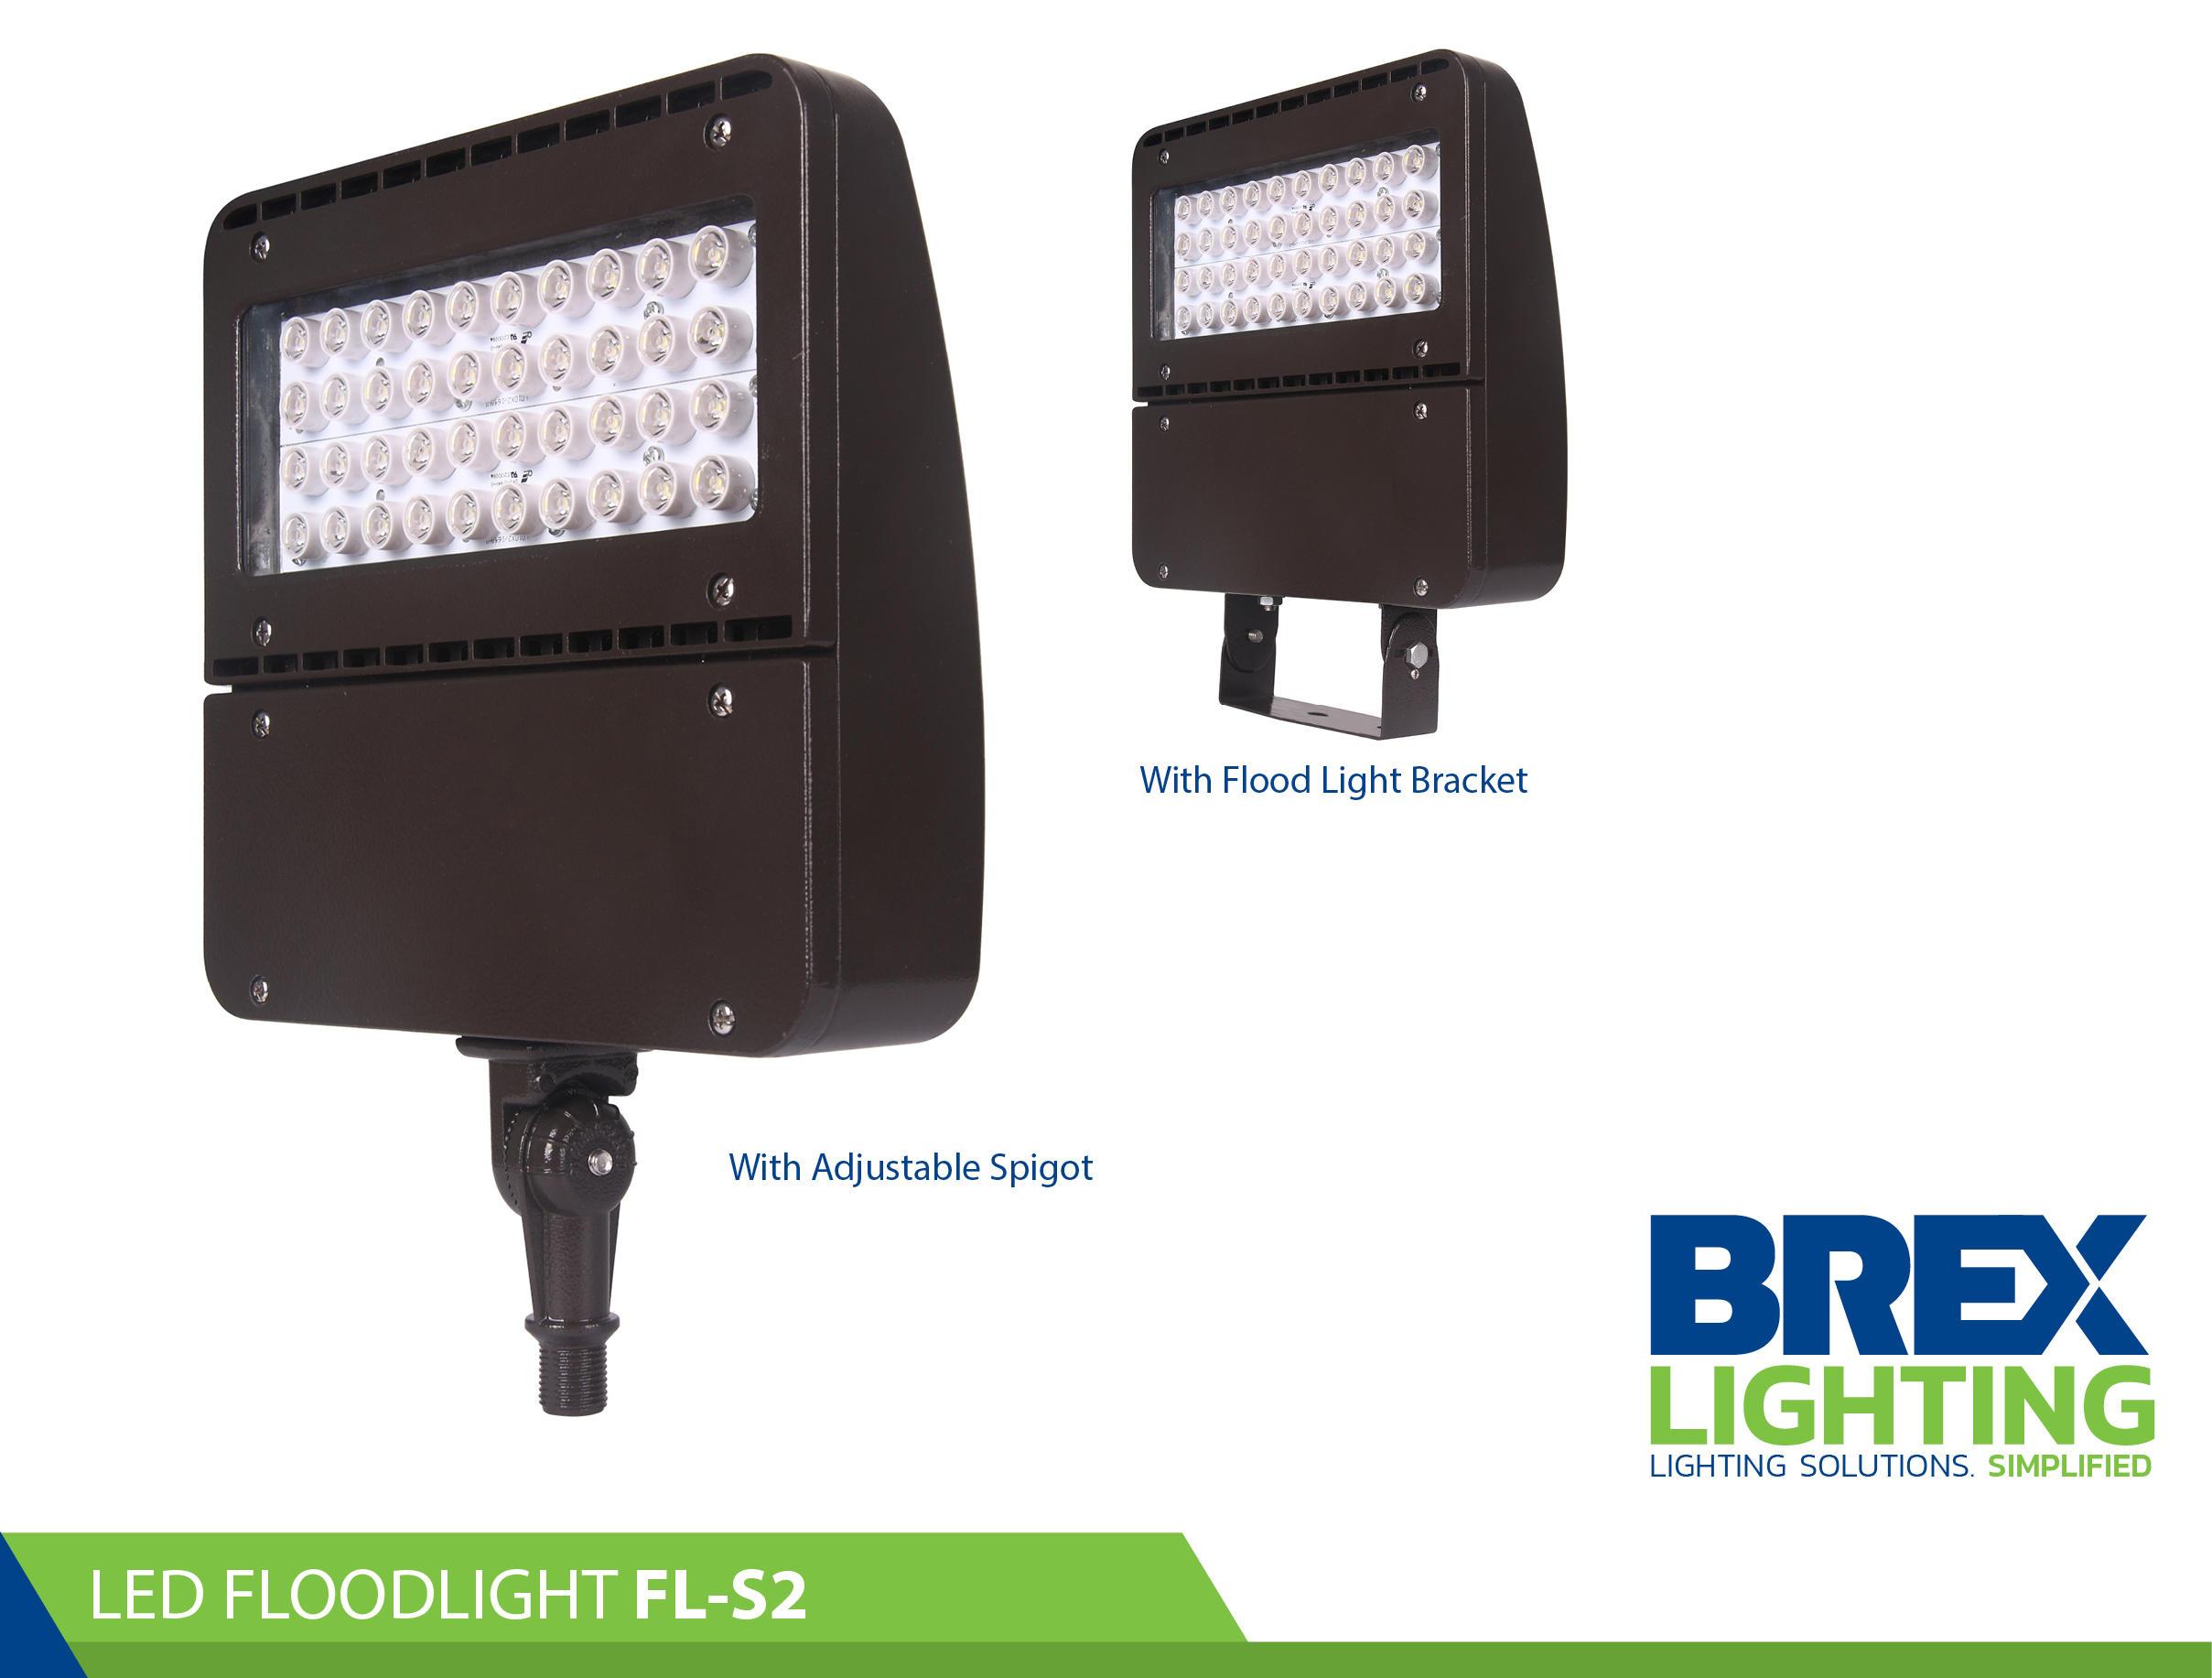 Brex Lighting image 1